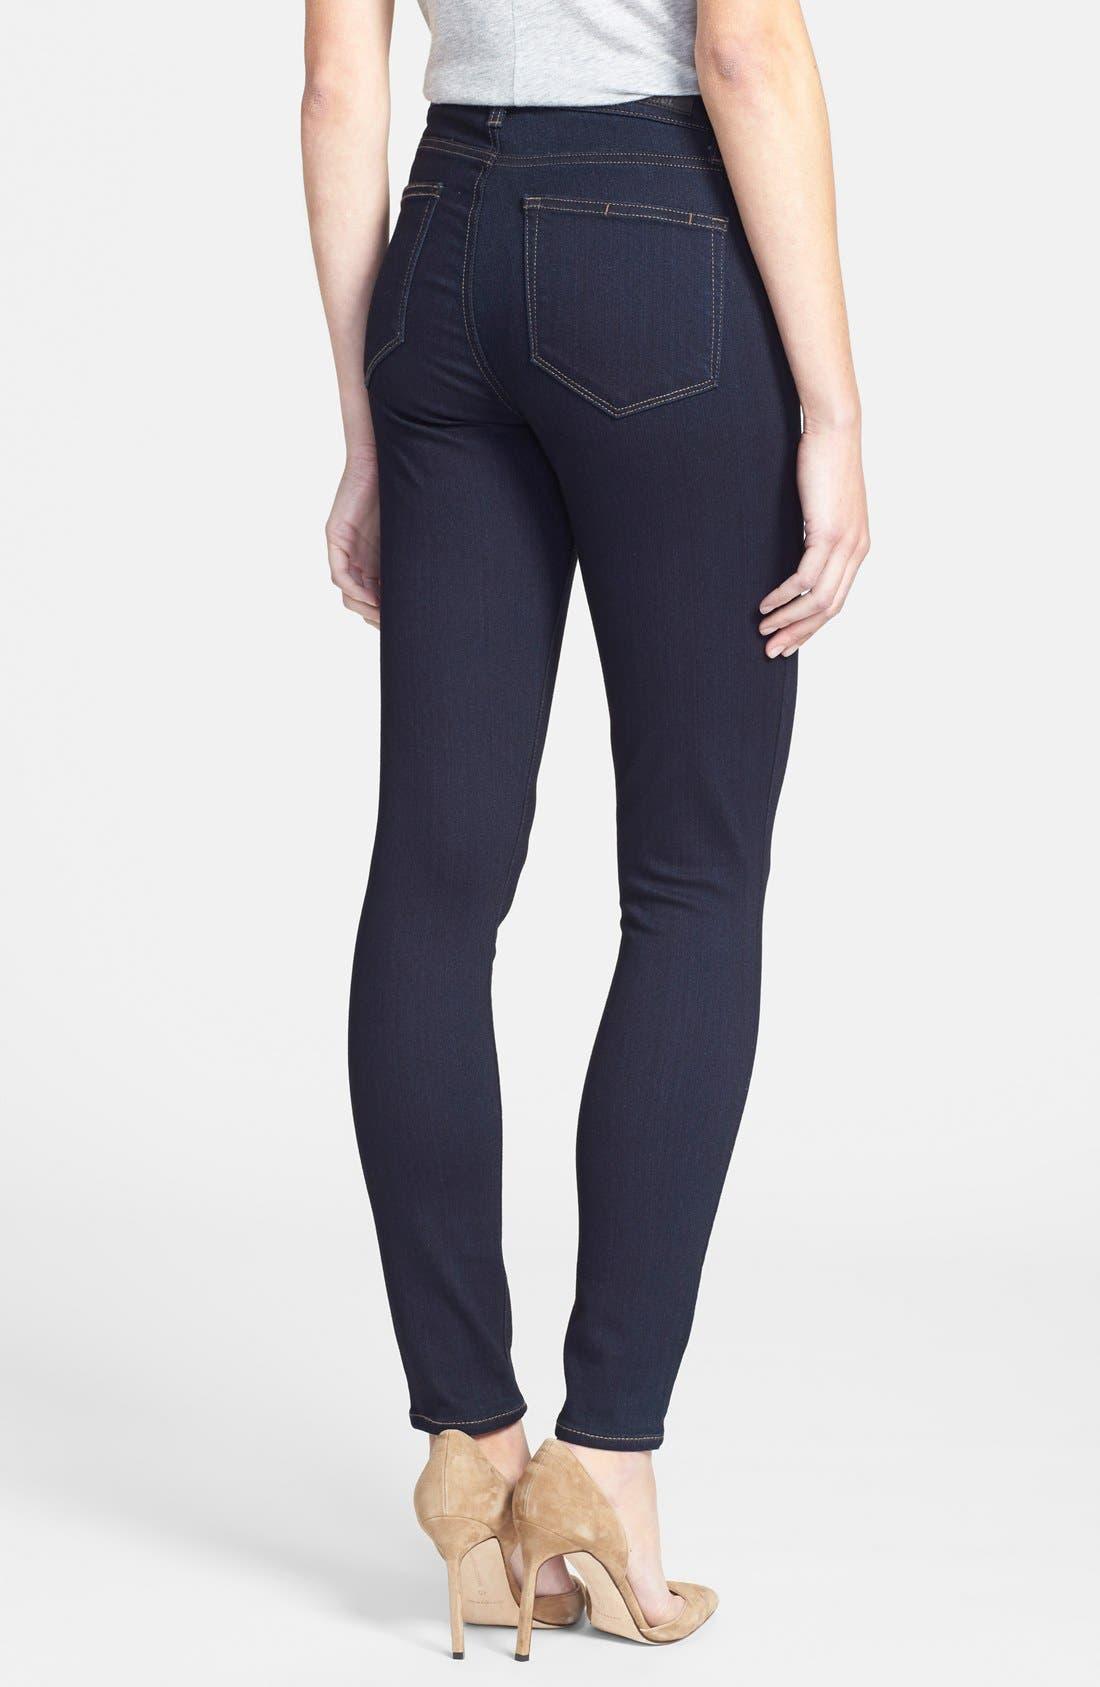 Denim 'Transcend - Hoxton' High Rise Ankle Jeans,                             Alternate thumbnail 2, color,                             001